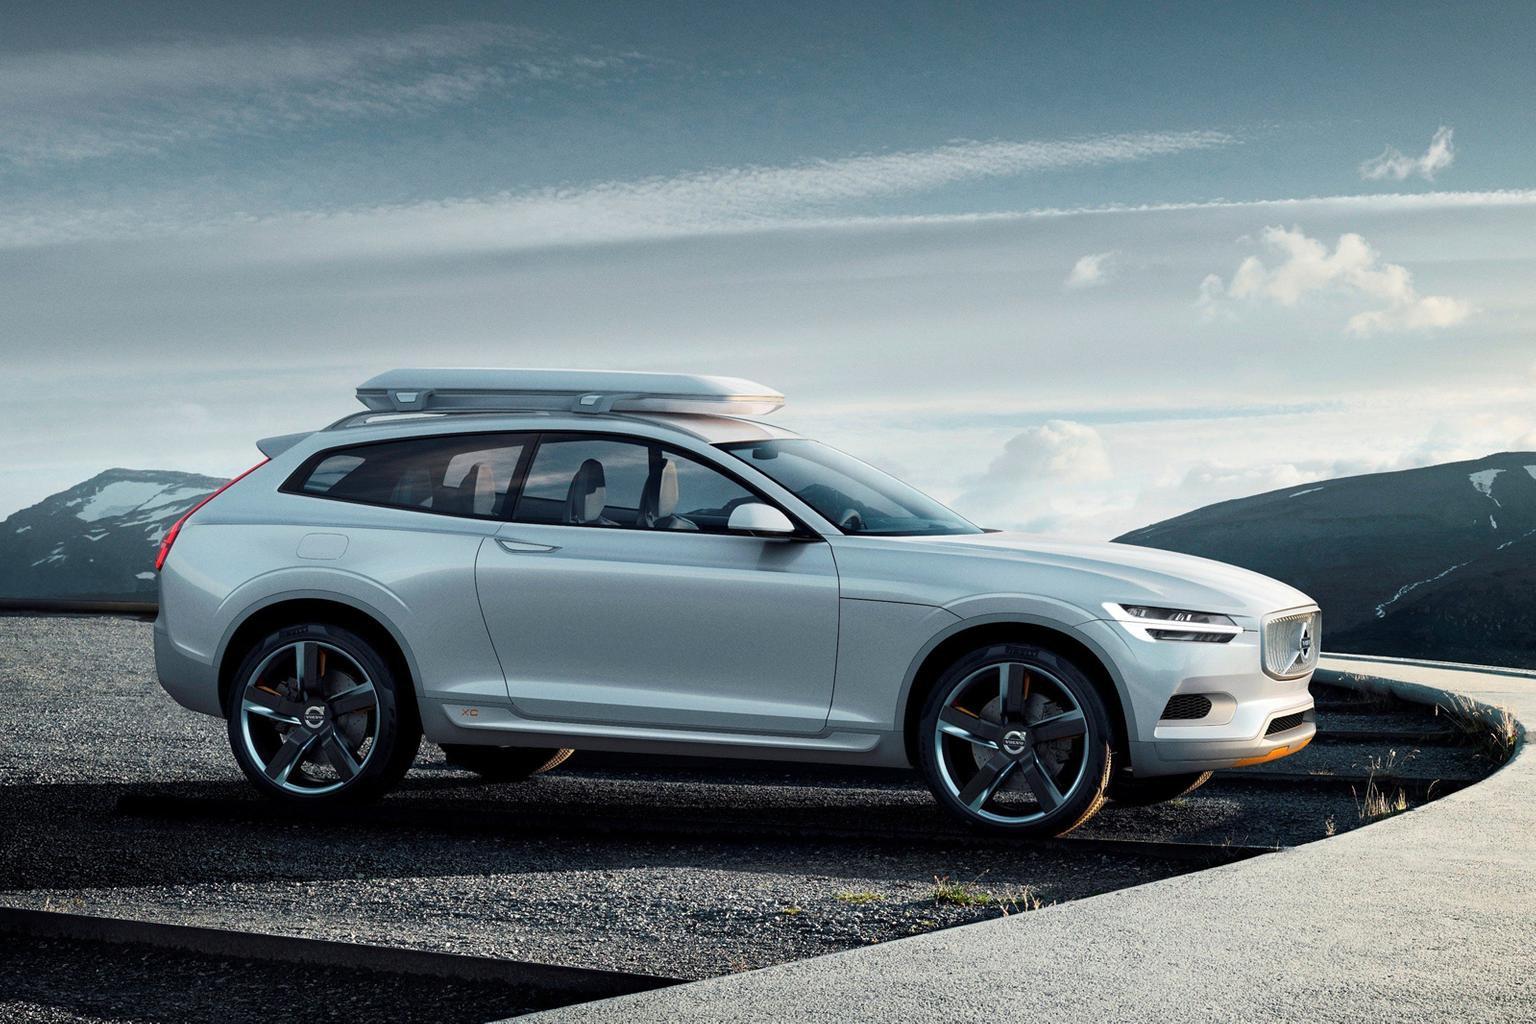 2015 Volvo XC90 hybrid will beat 100mpg